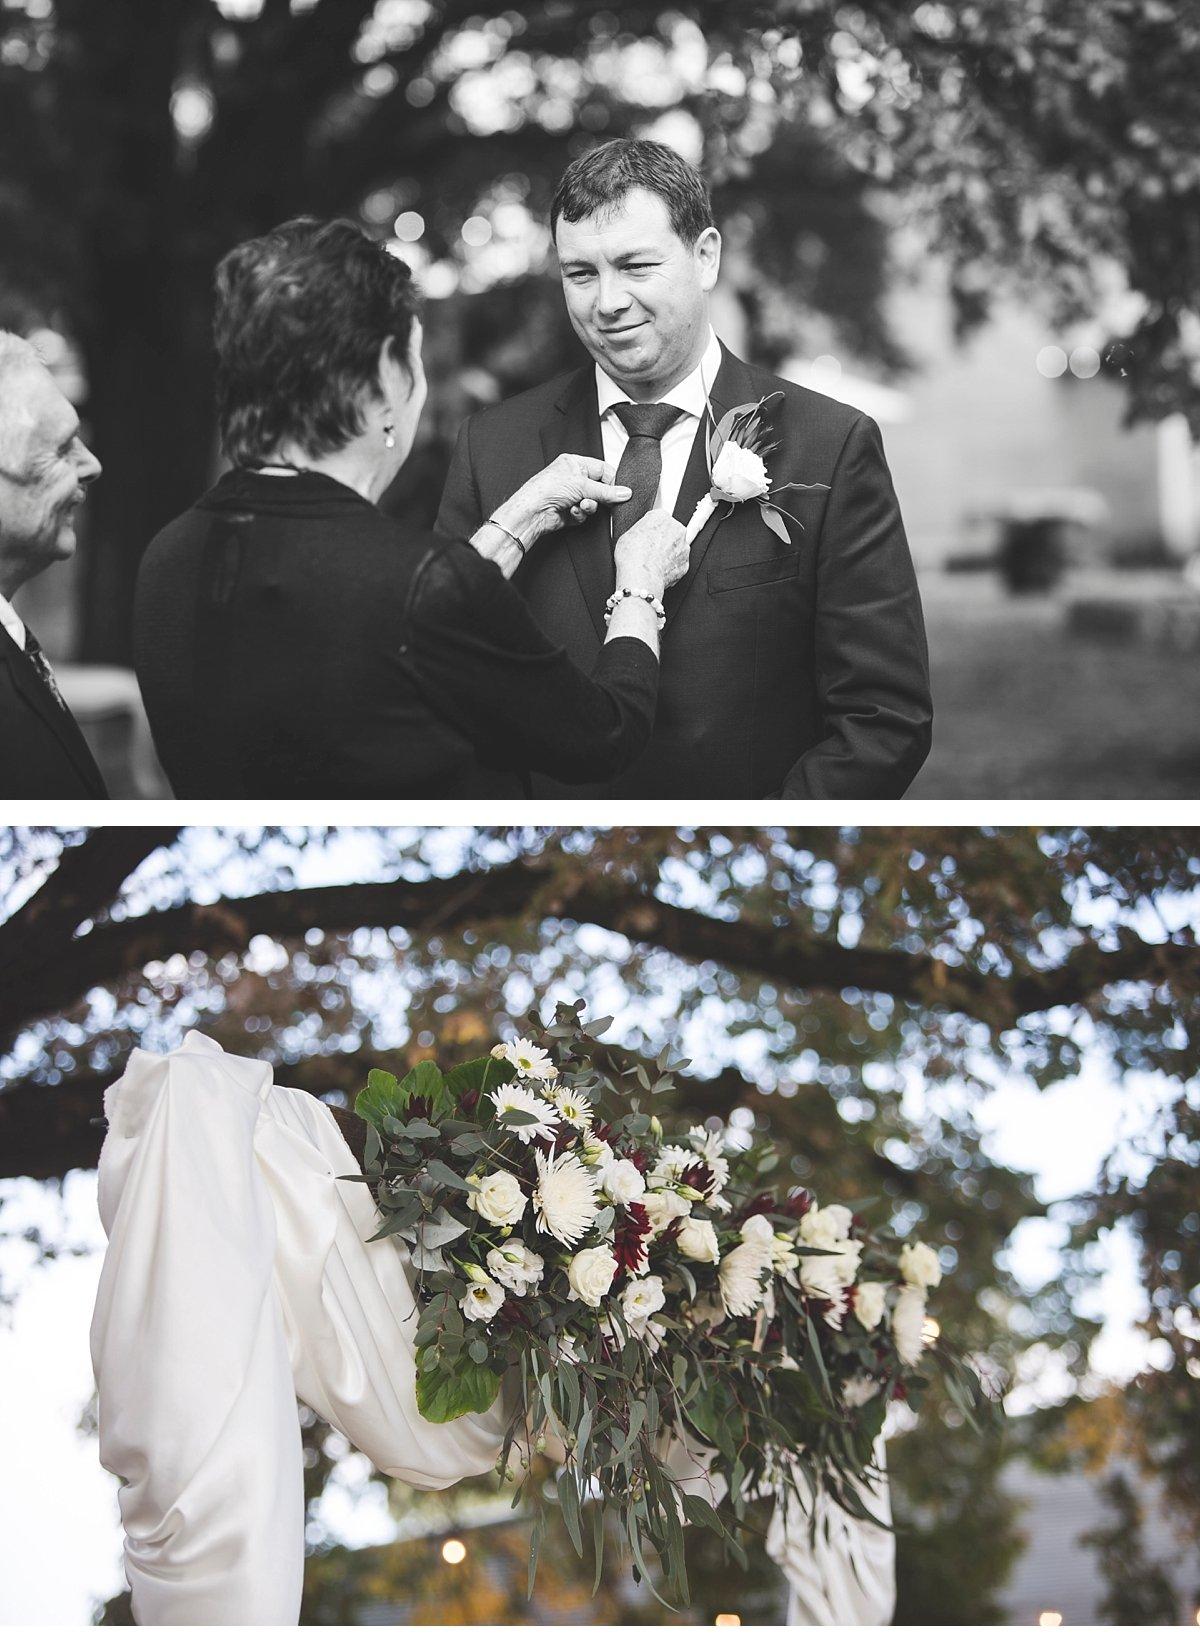 Burandana Hall wedding by Wagga Wagga Wedding Photographer Peppermint Studios_St Michaels Cathedral Wagga_Deniliquin weddings_0165